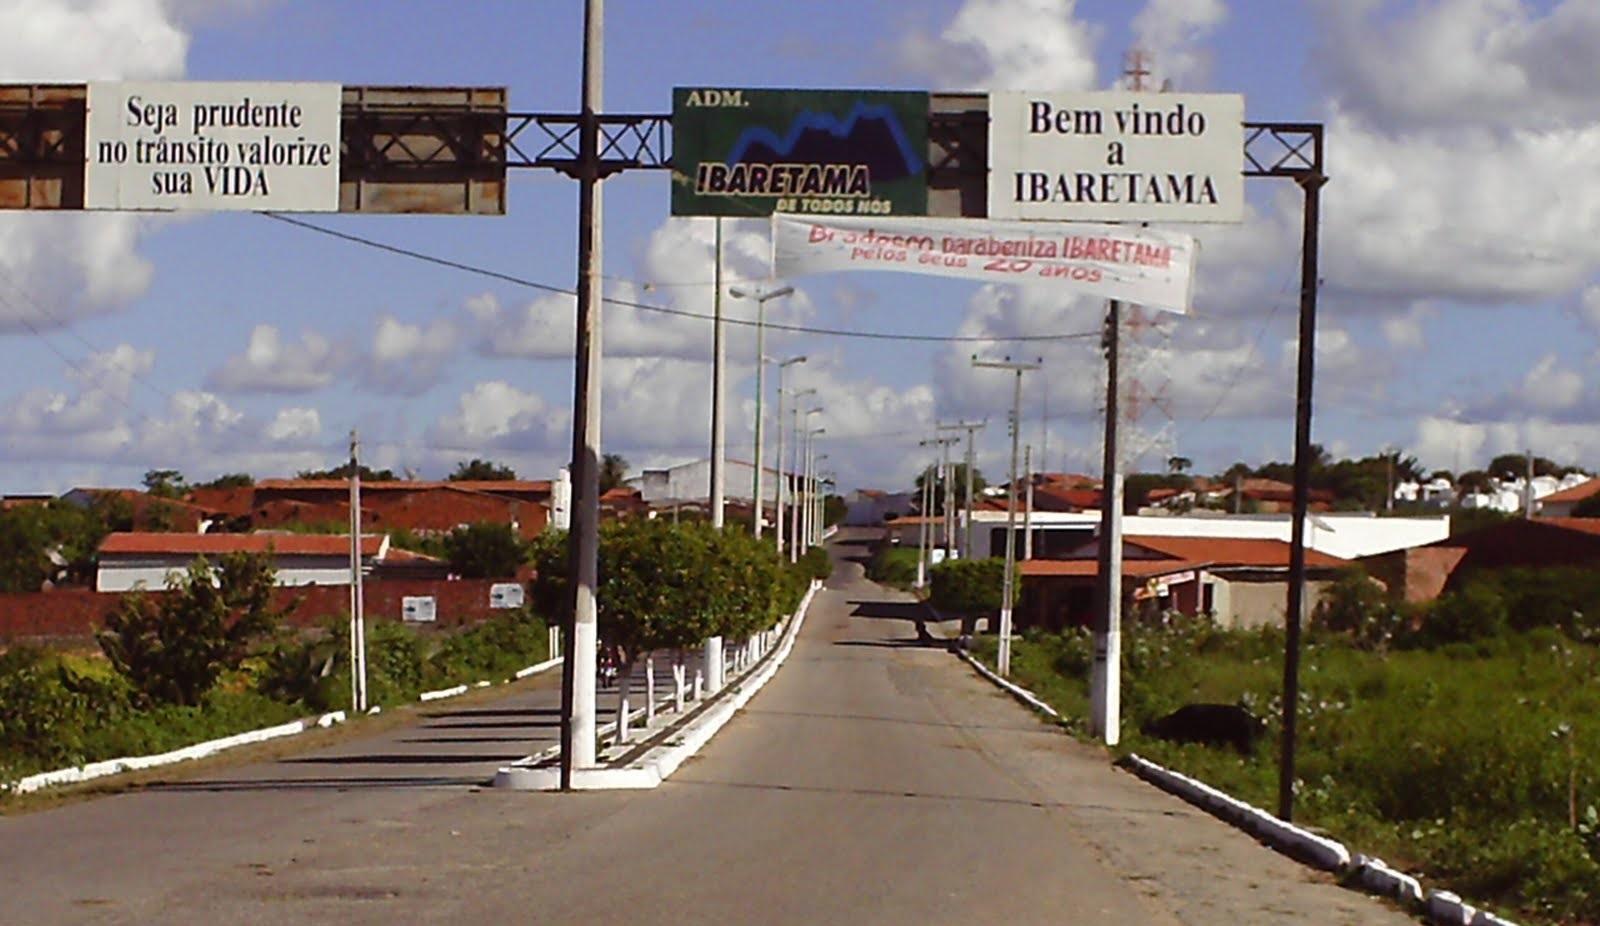 Ibaretama Ceará fonte: www.idace.ce.gov.br